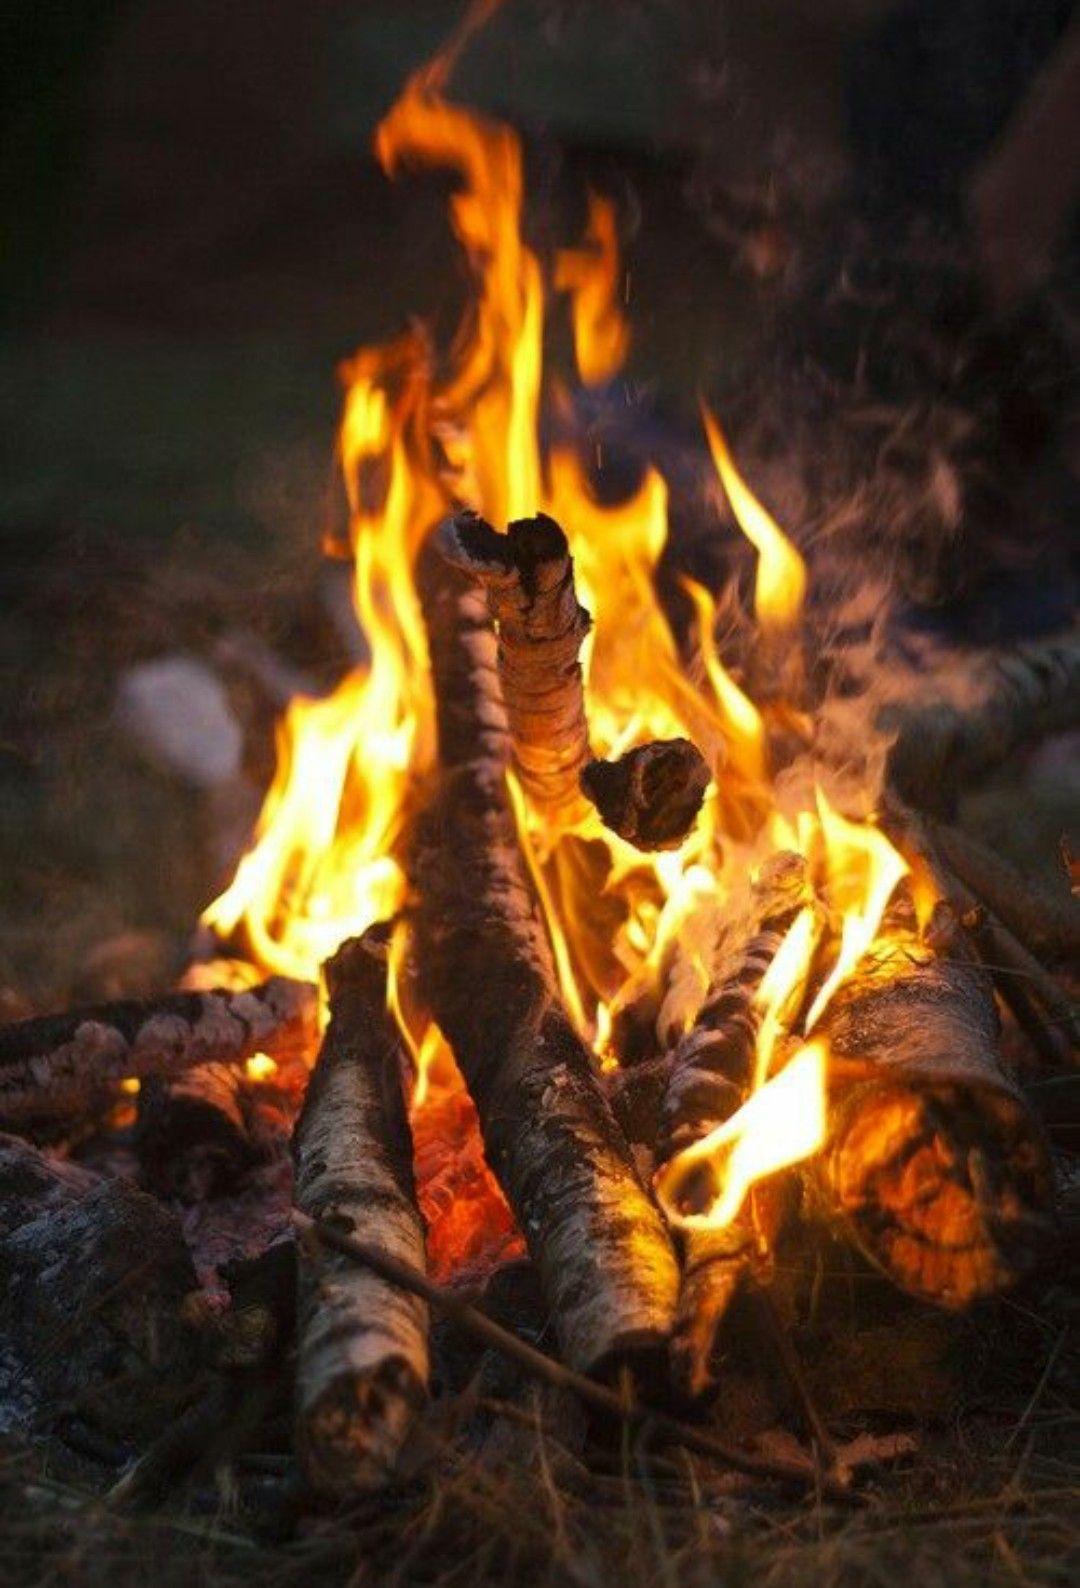 Fire Photography Campfire Fire